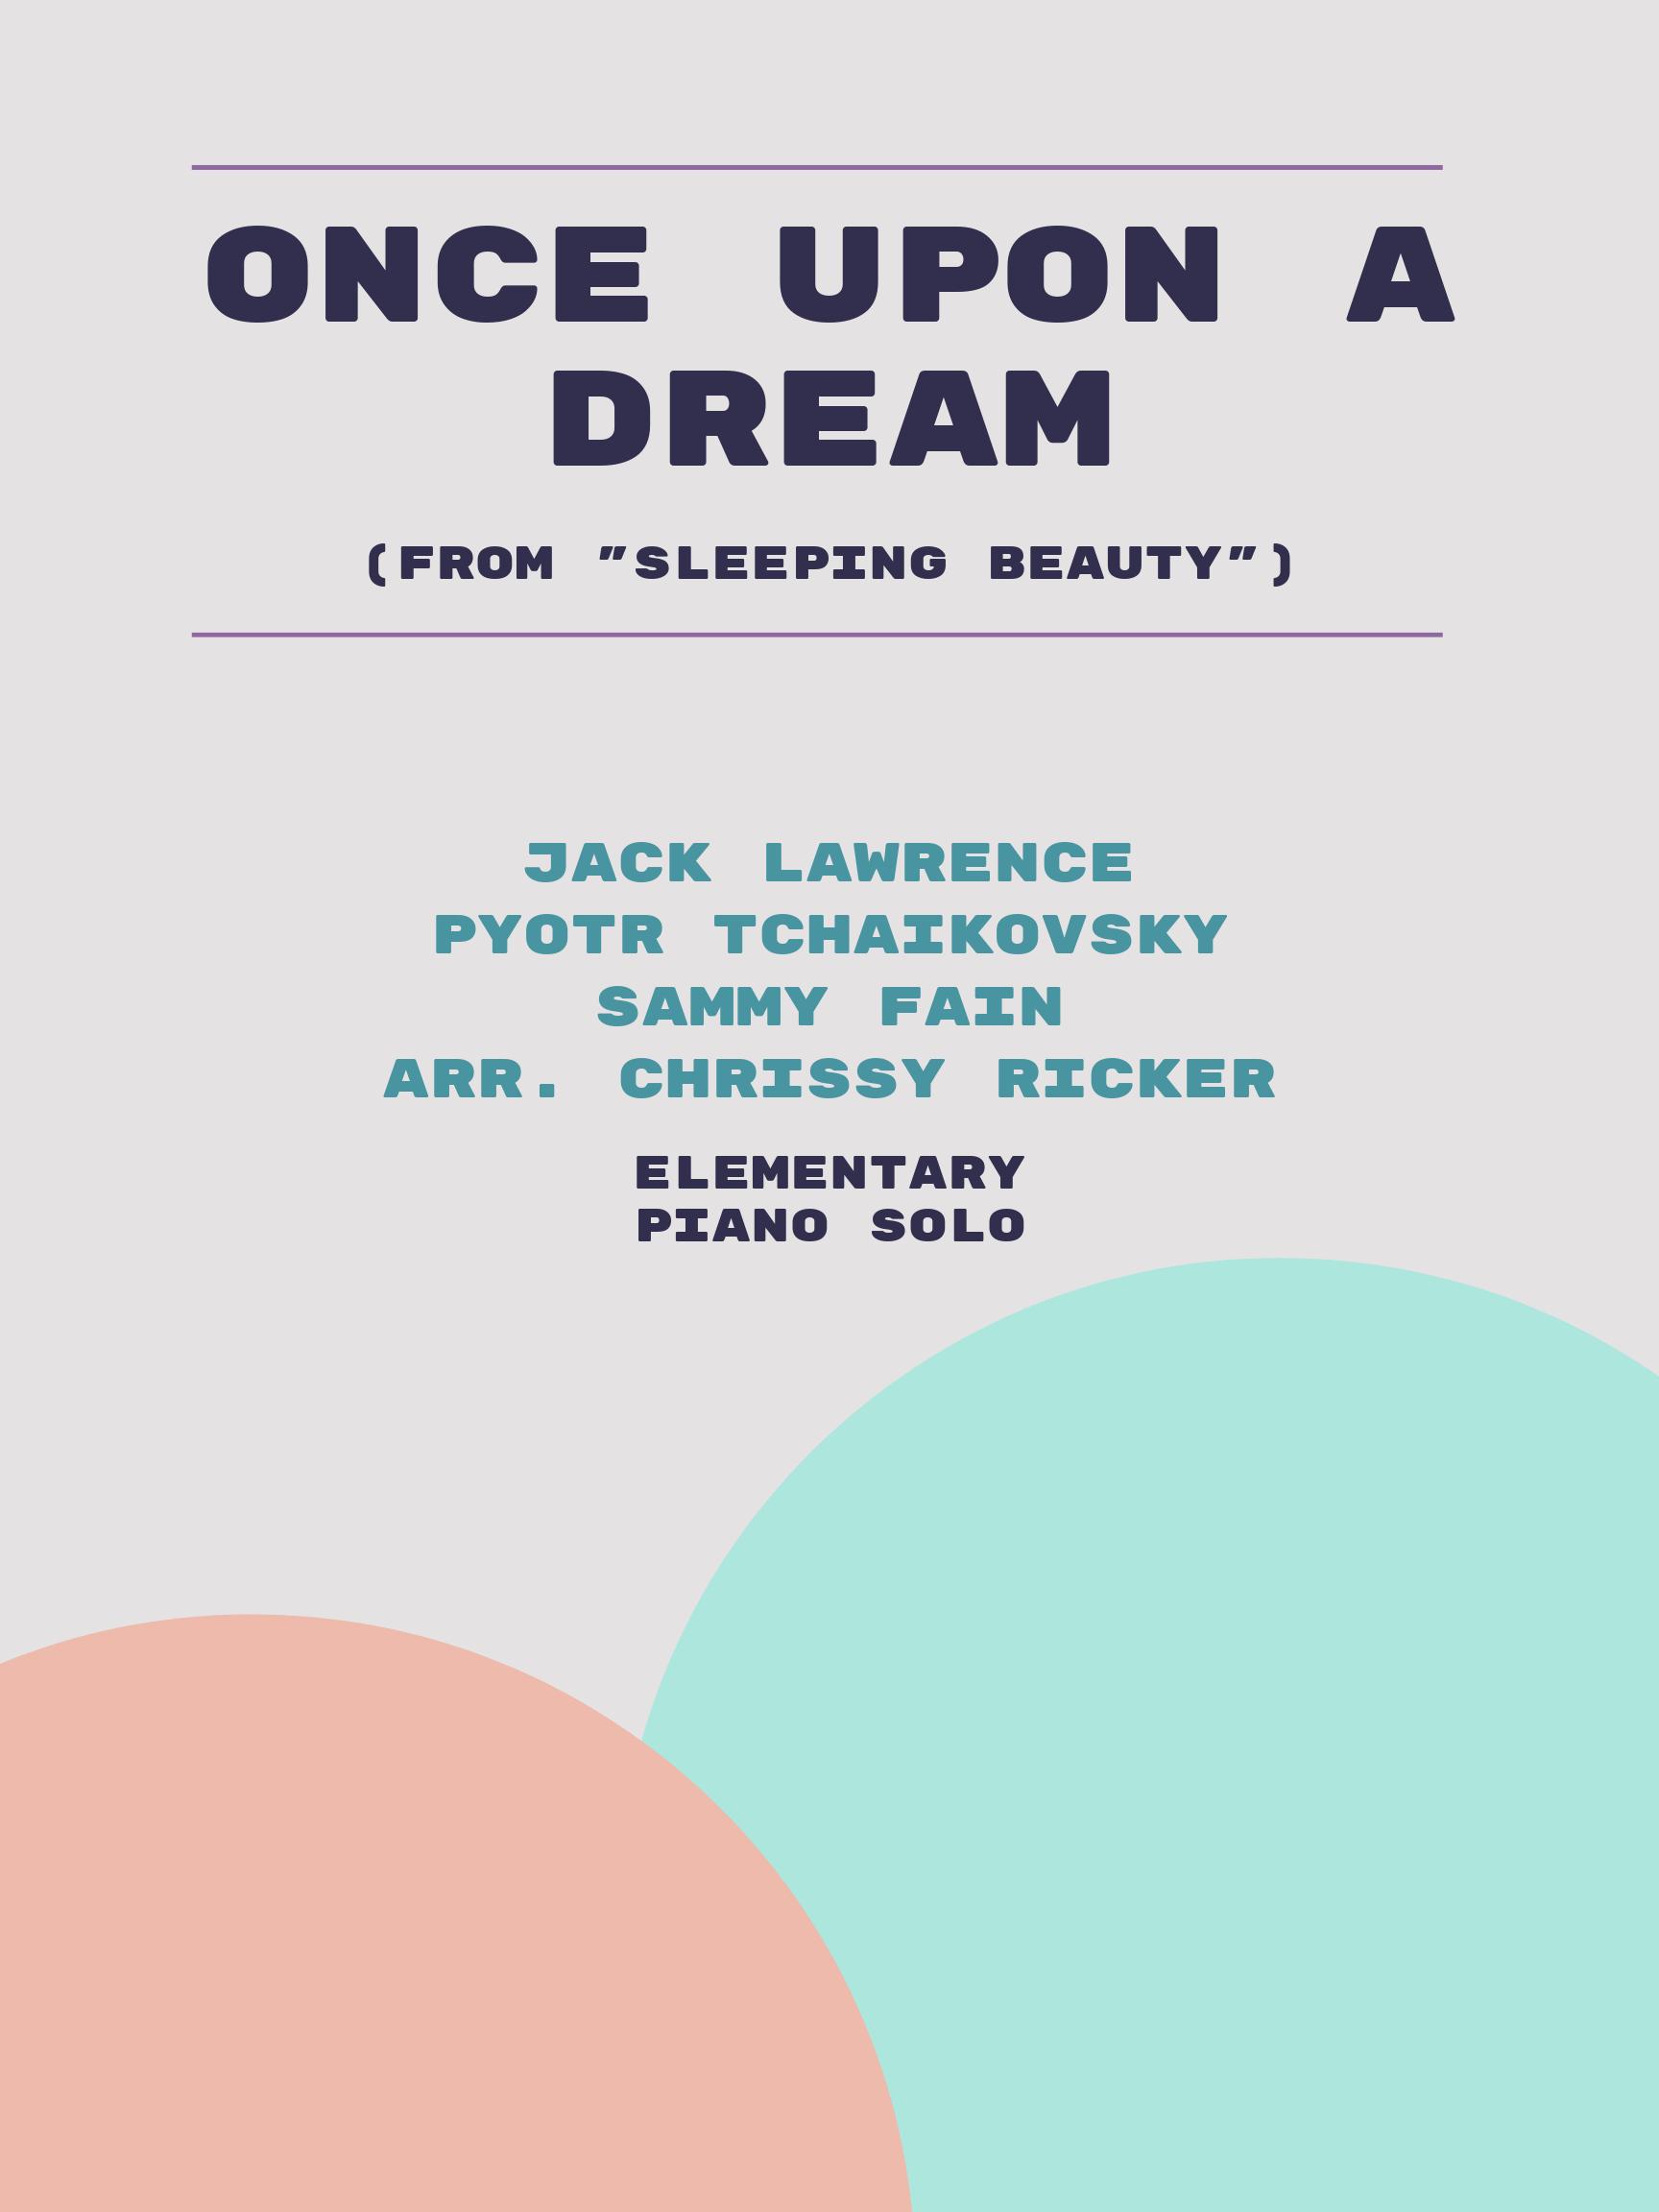 Once Upon a Dream by Jack Lawrence, Pyotr Tchaikovsky, Sammy Fain